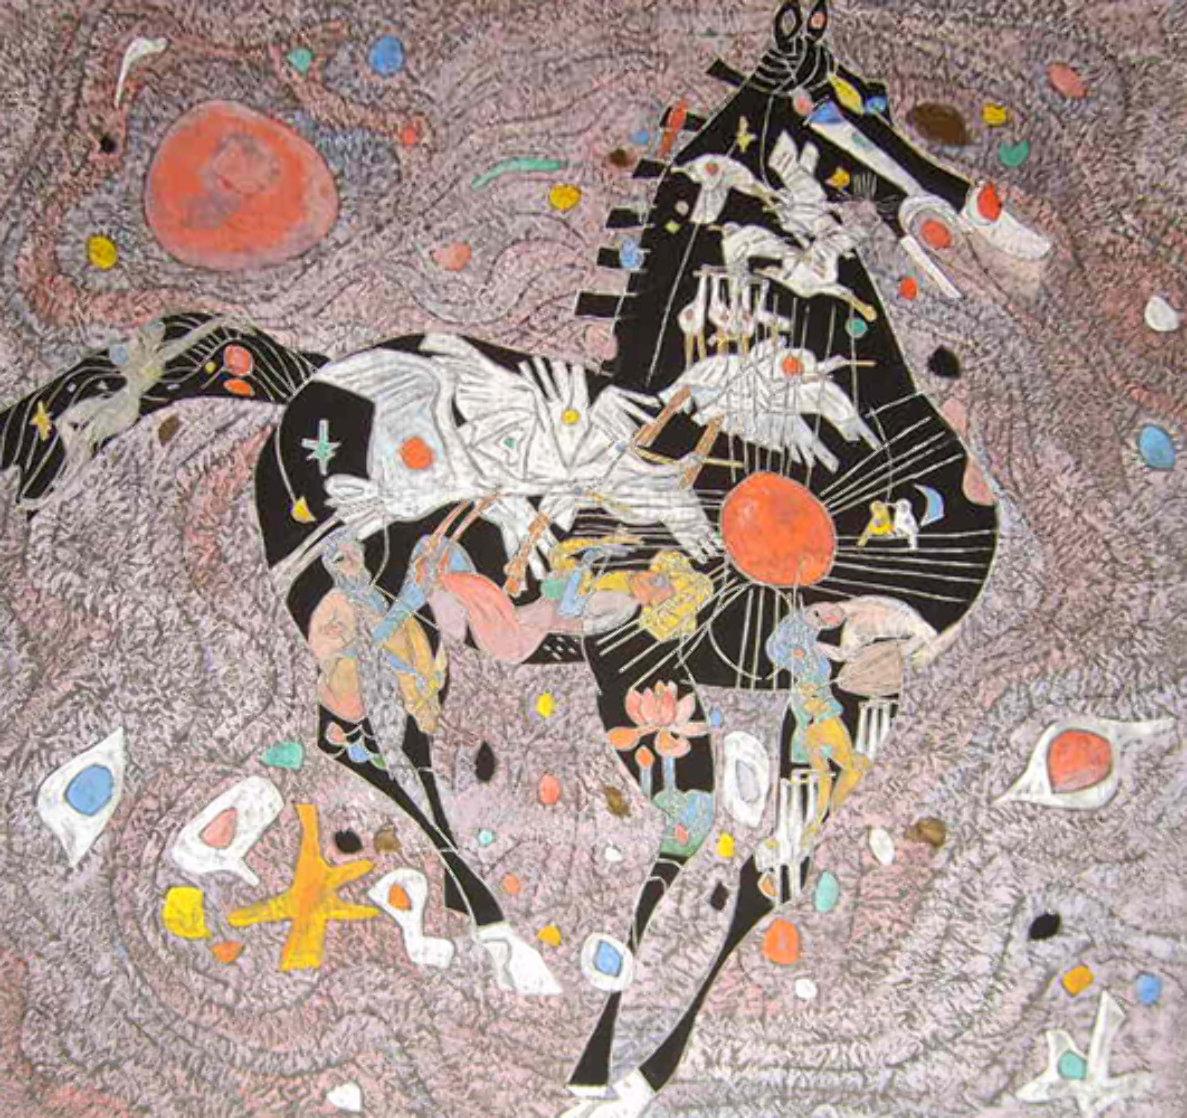 Black Horse 1988 40x40 Huge Original Painting by Tie-Feng Jiang